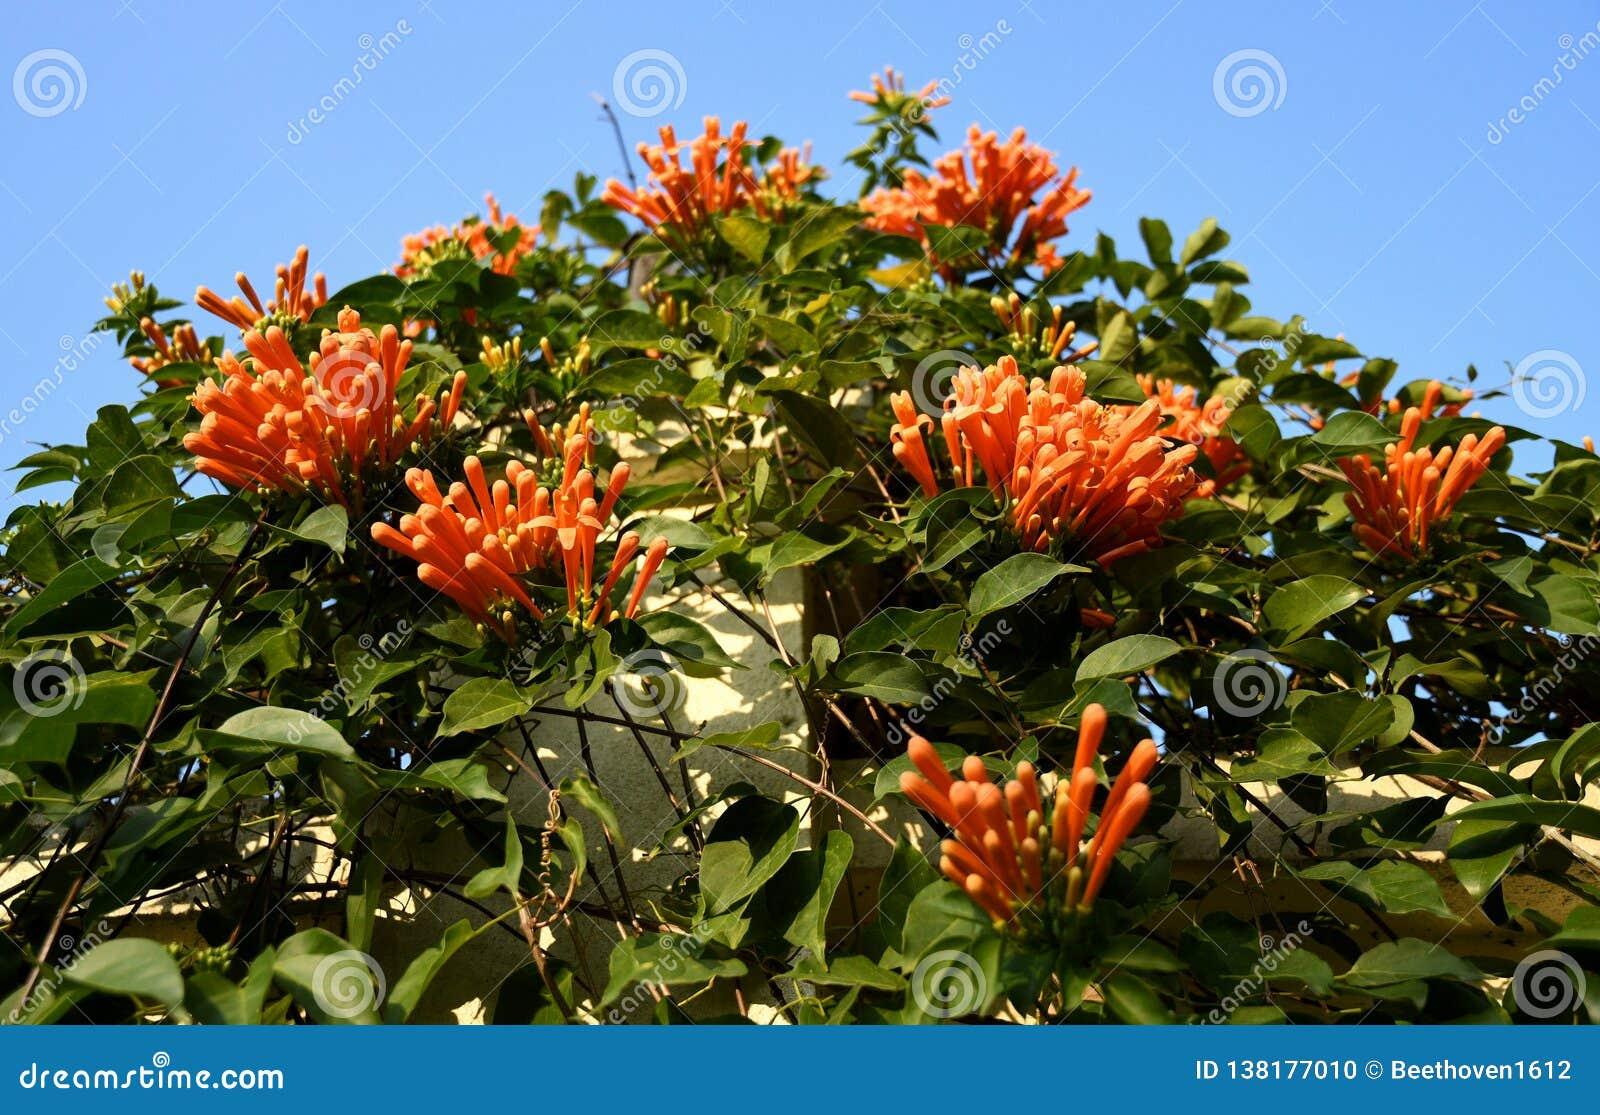 Fleur de trompette de Pyrostegia Venusta Oange